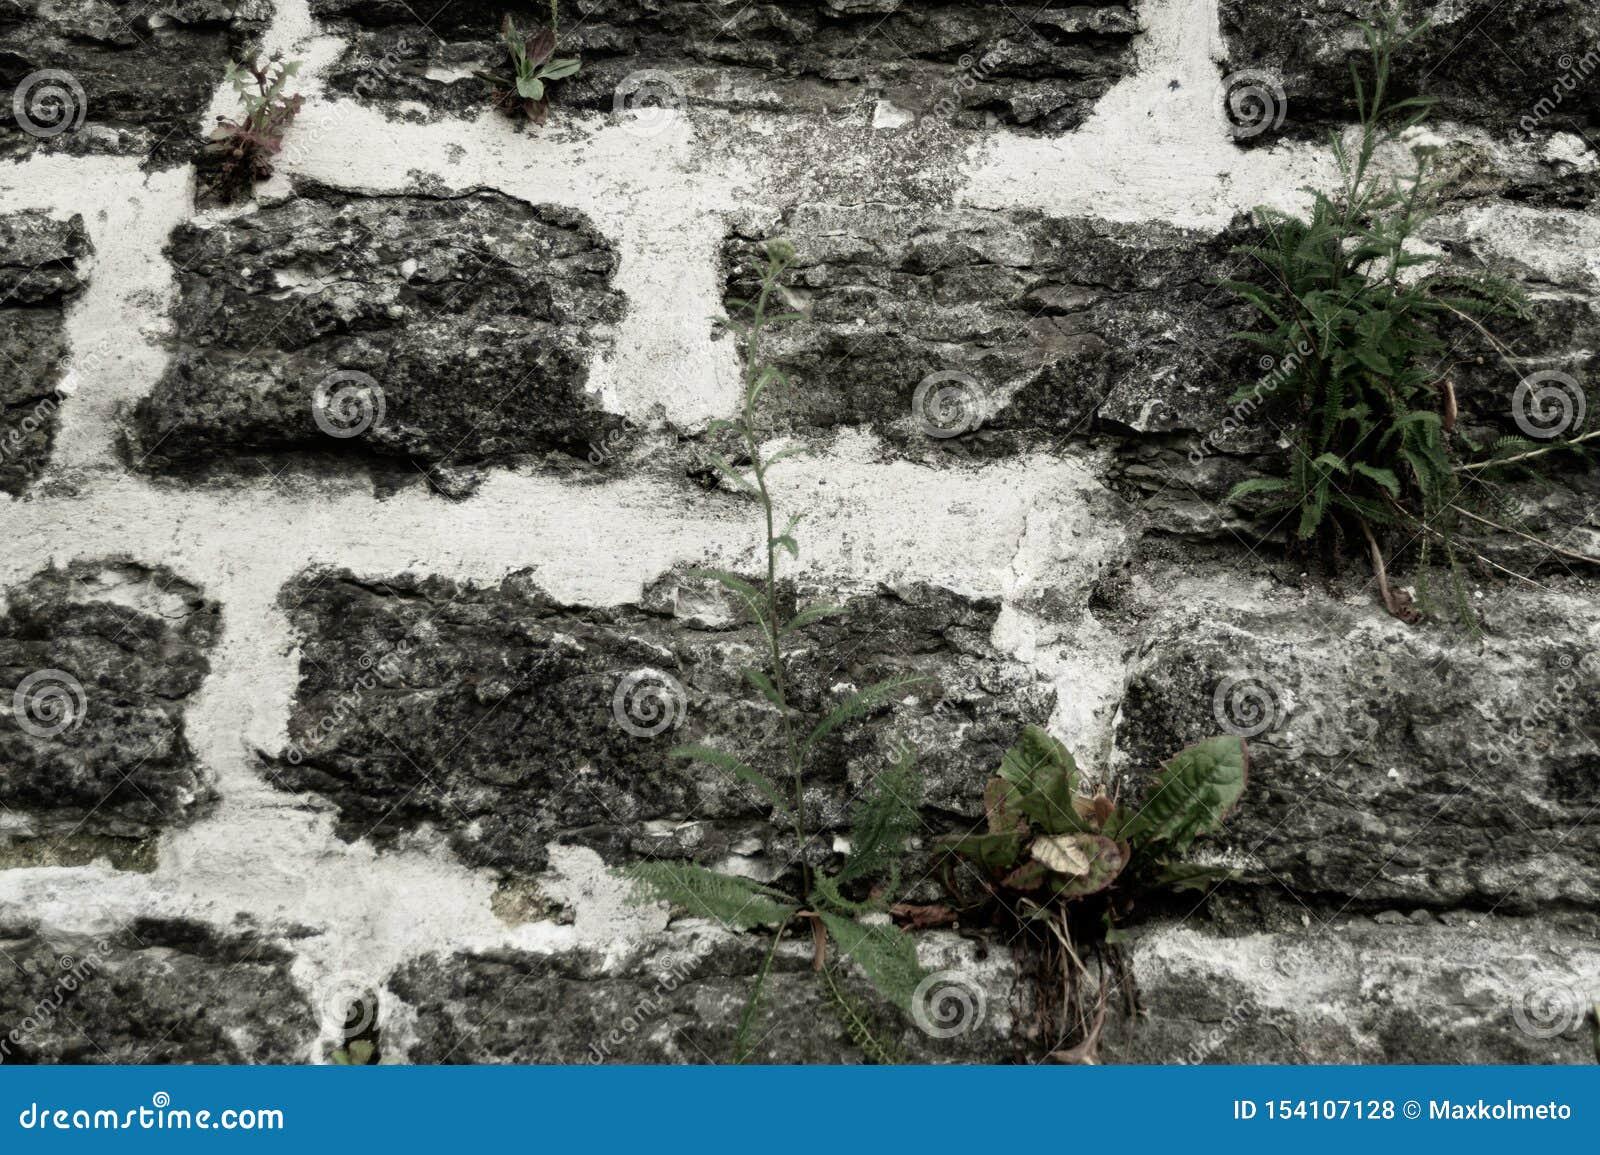 Stone wall background. abstract gray grunge texture. rocky brick wall masonry